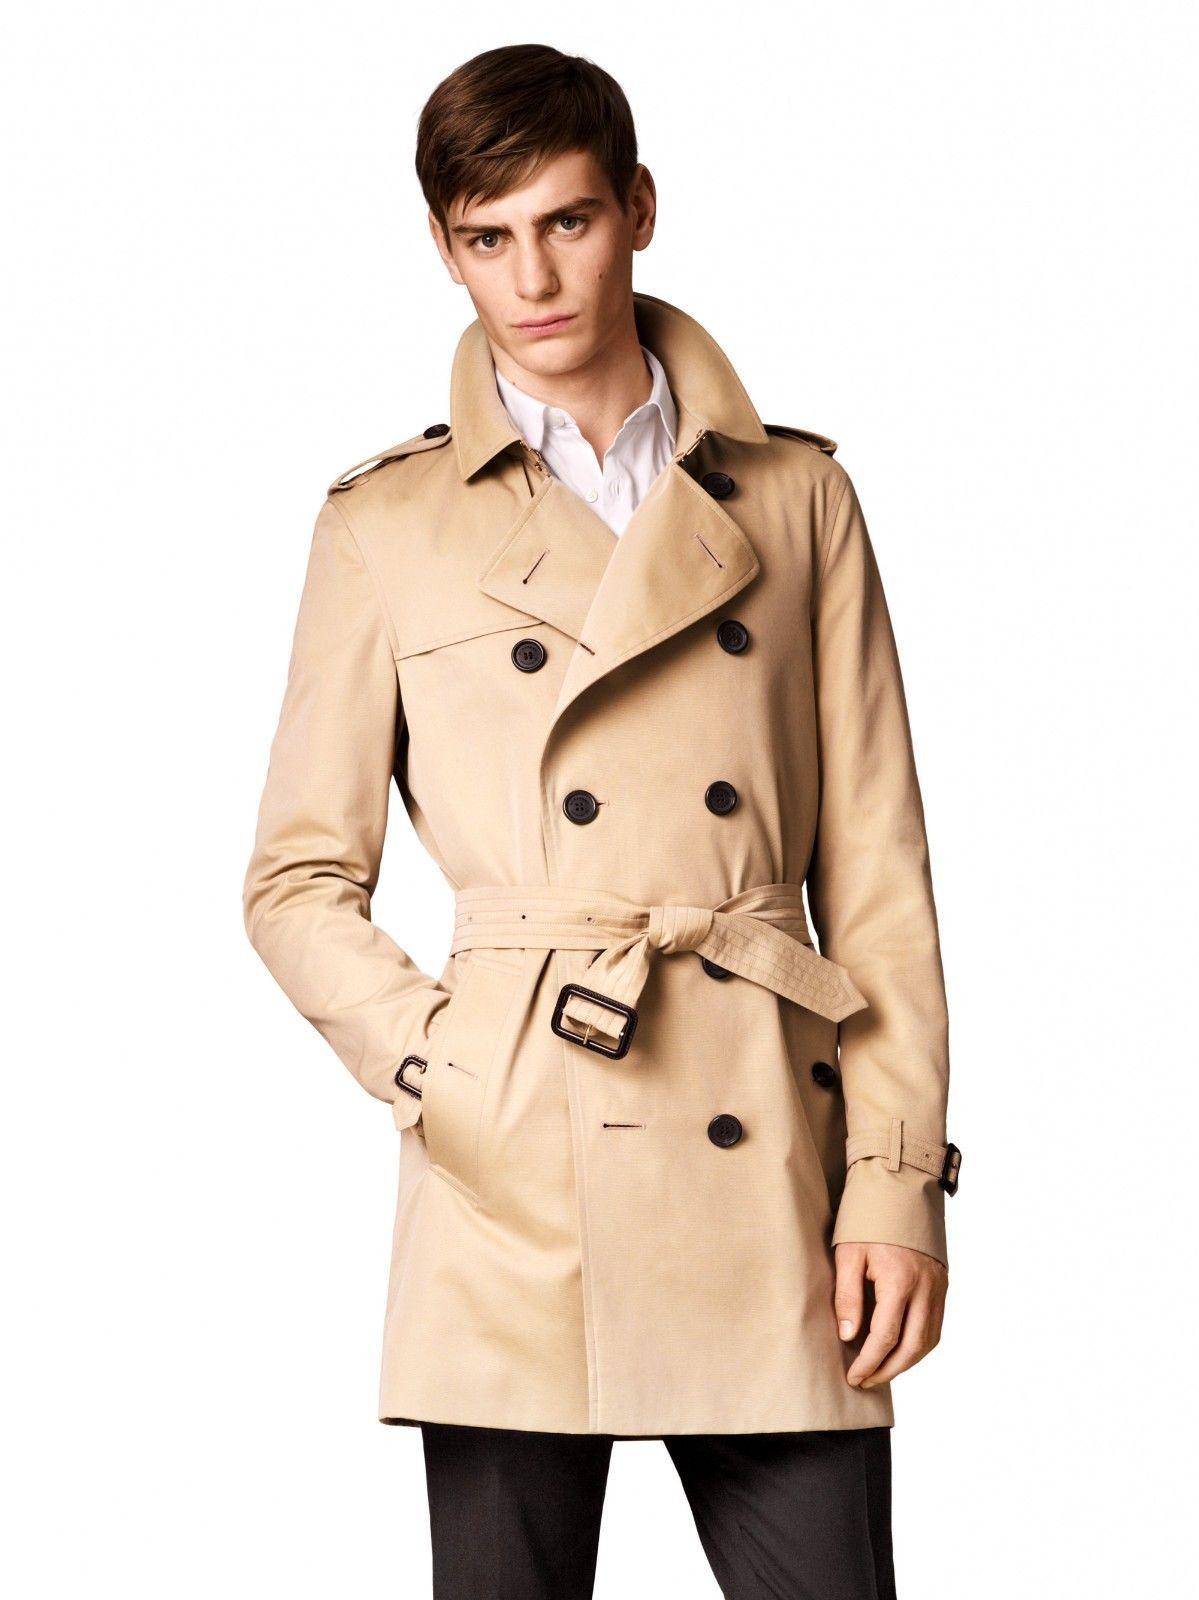 Vtg Mens Short Burberry Kensington Trench Coat Double Breasted Mac Jacket Med Ebay Trench Coat Coat Jackets